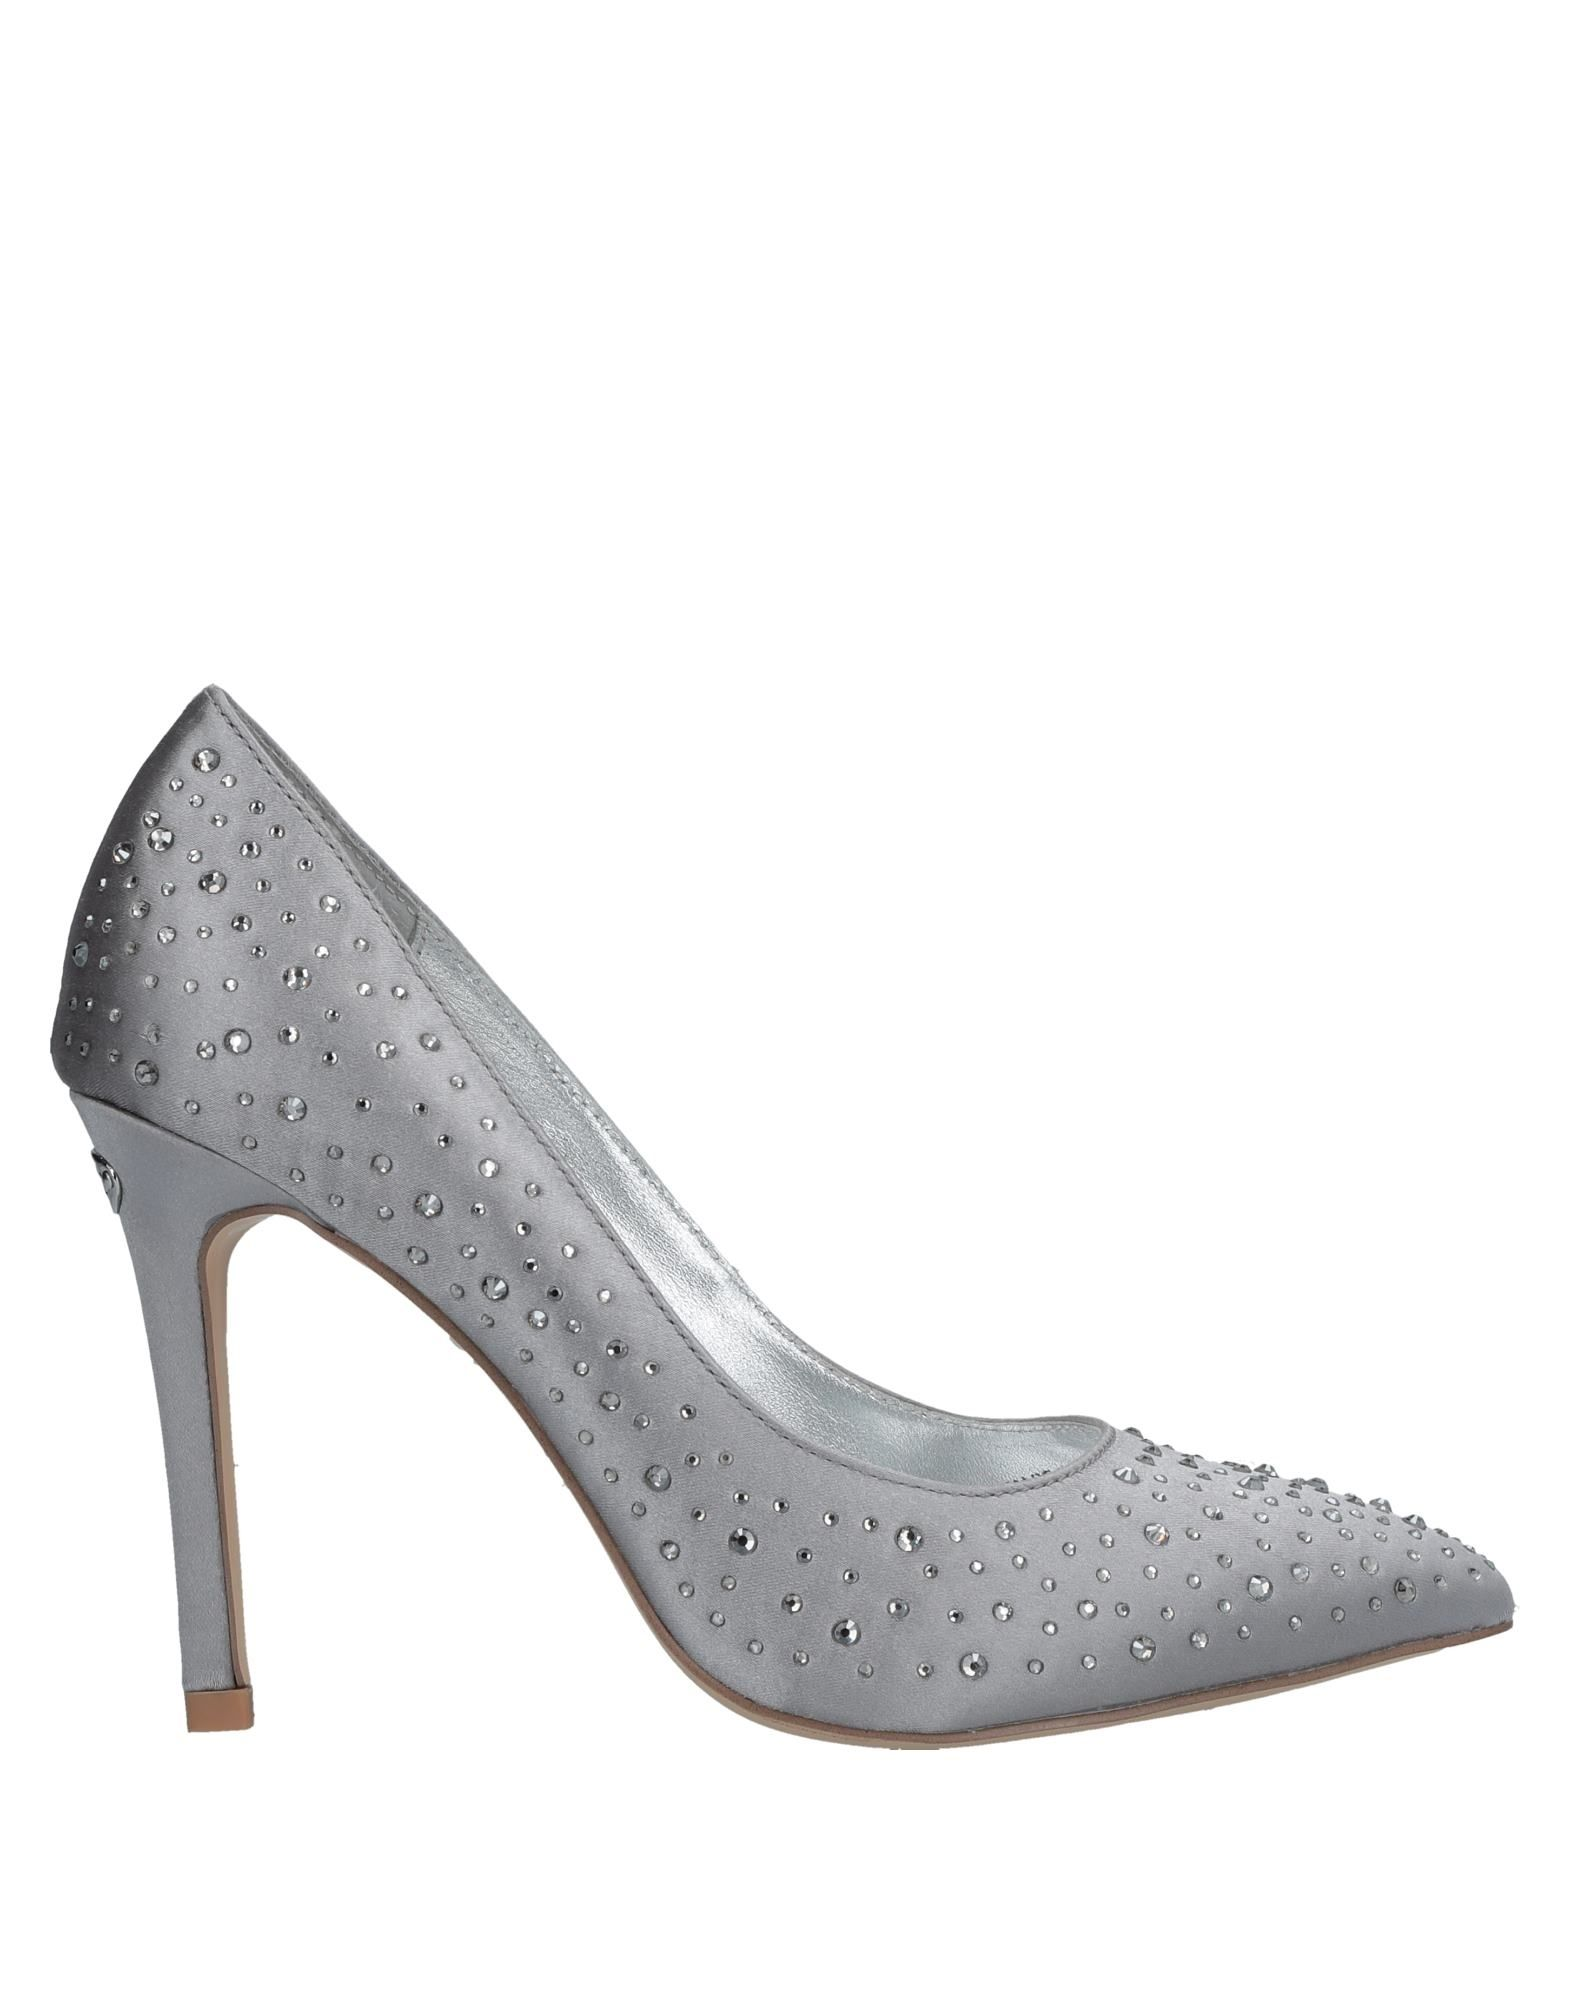 Liu •Jo Shoes Pumps Damen  11109723RU Gute Qualität beliebte Schuhe